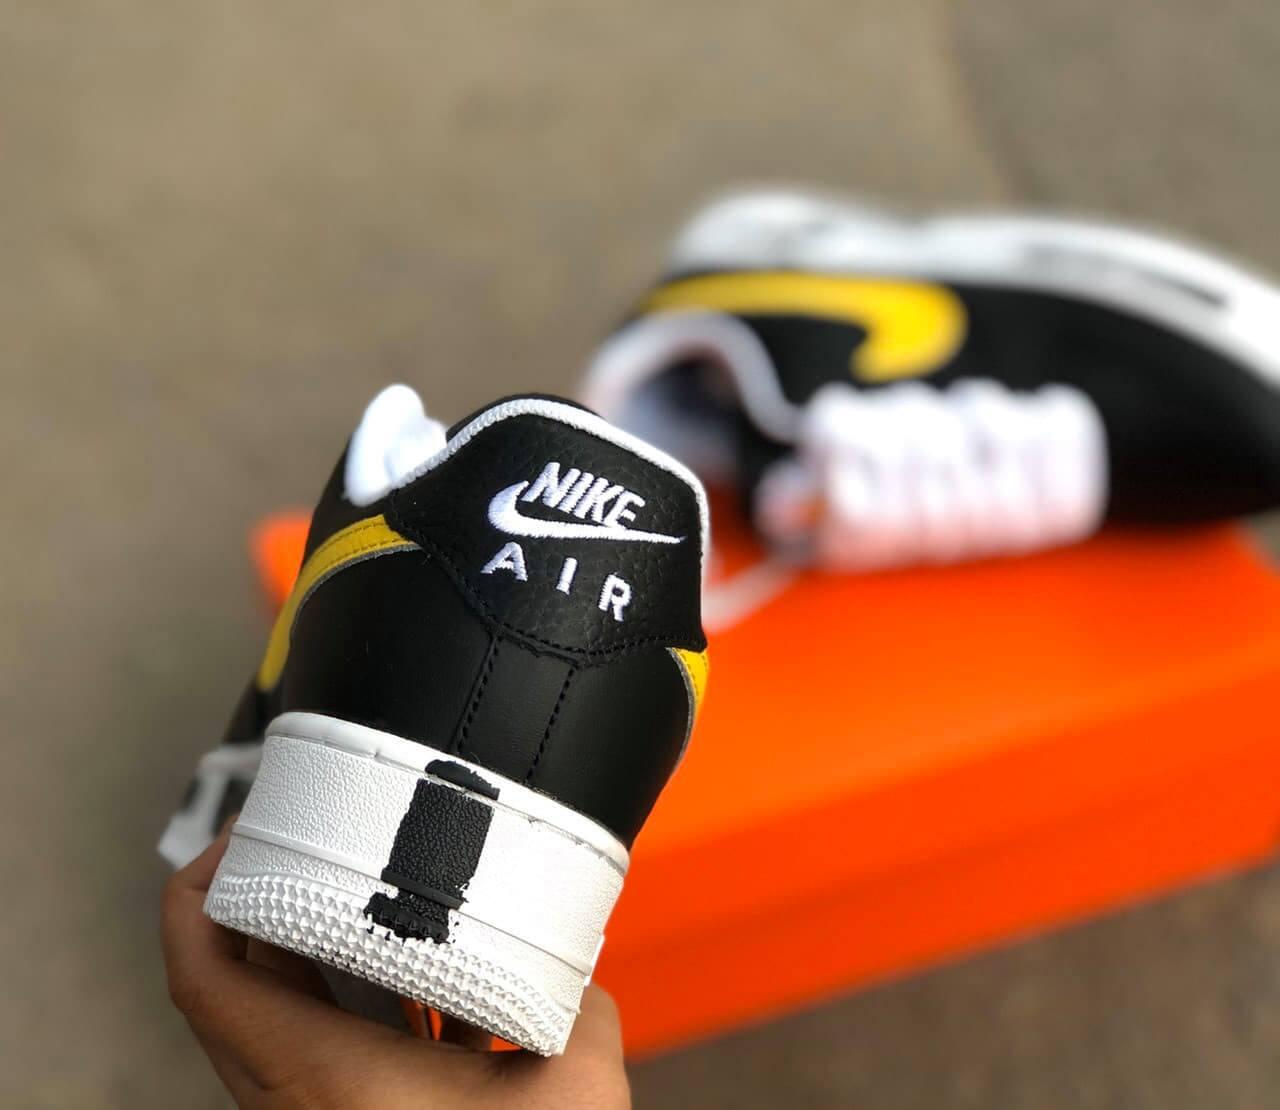 Nike Air Force 1 G-Dragon Edition Yellow